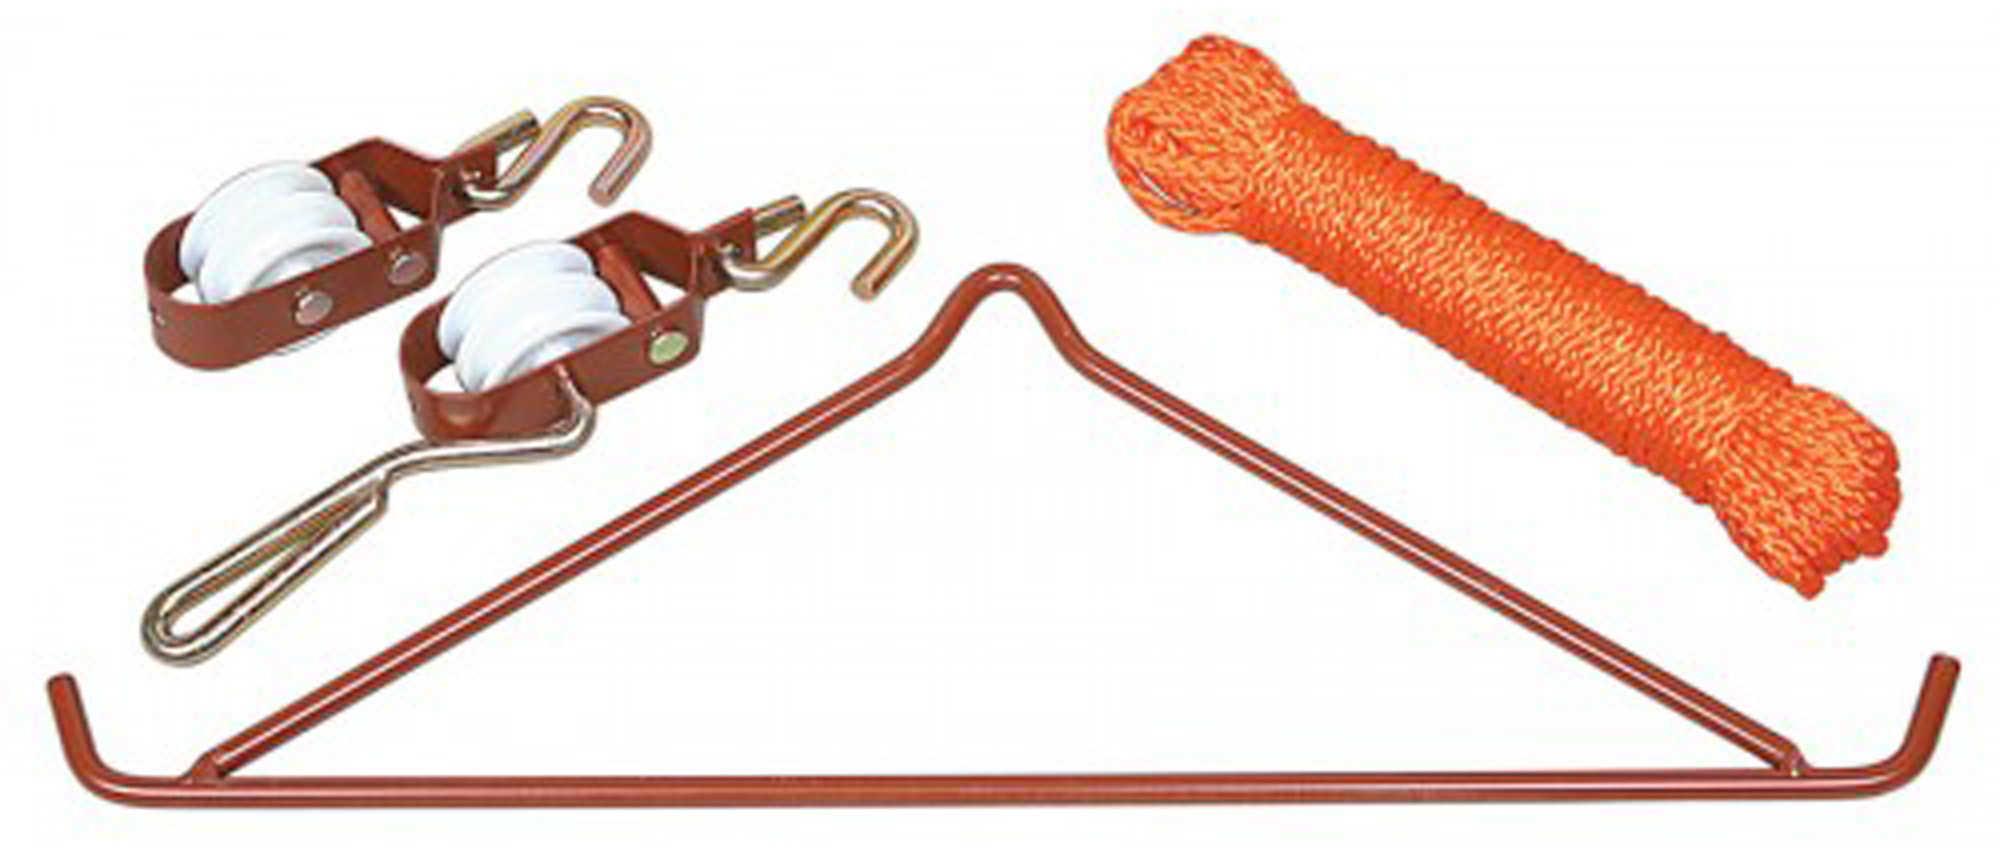 Allen Gambrel And Hoist Kit Standard Version Md: 1811